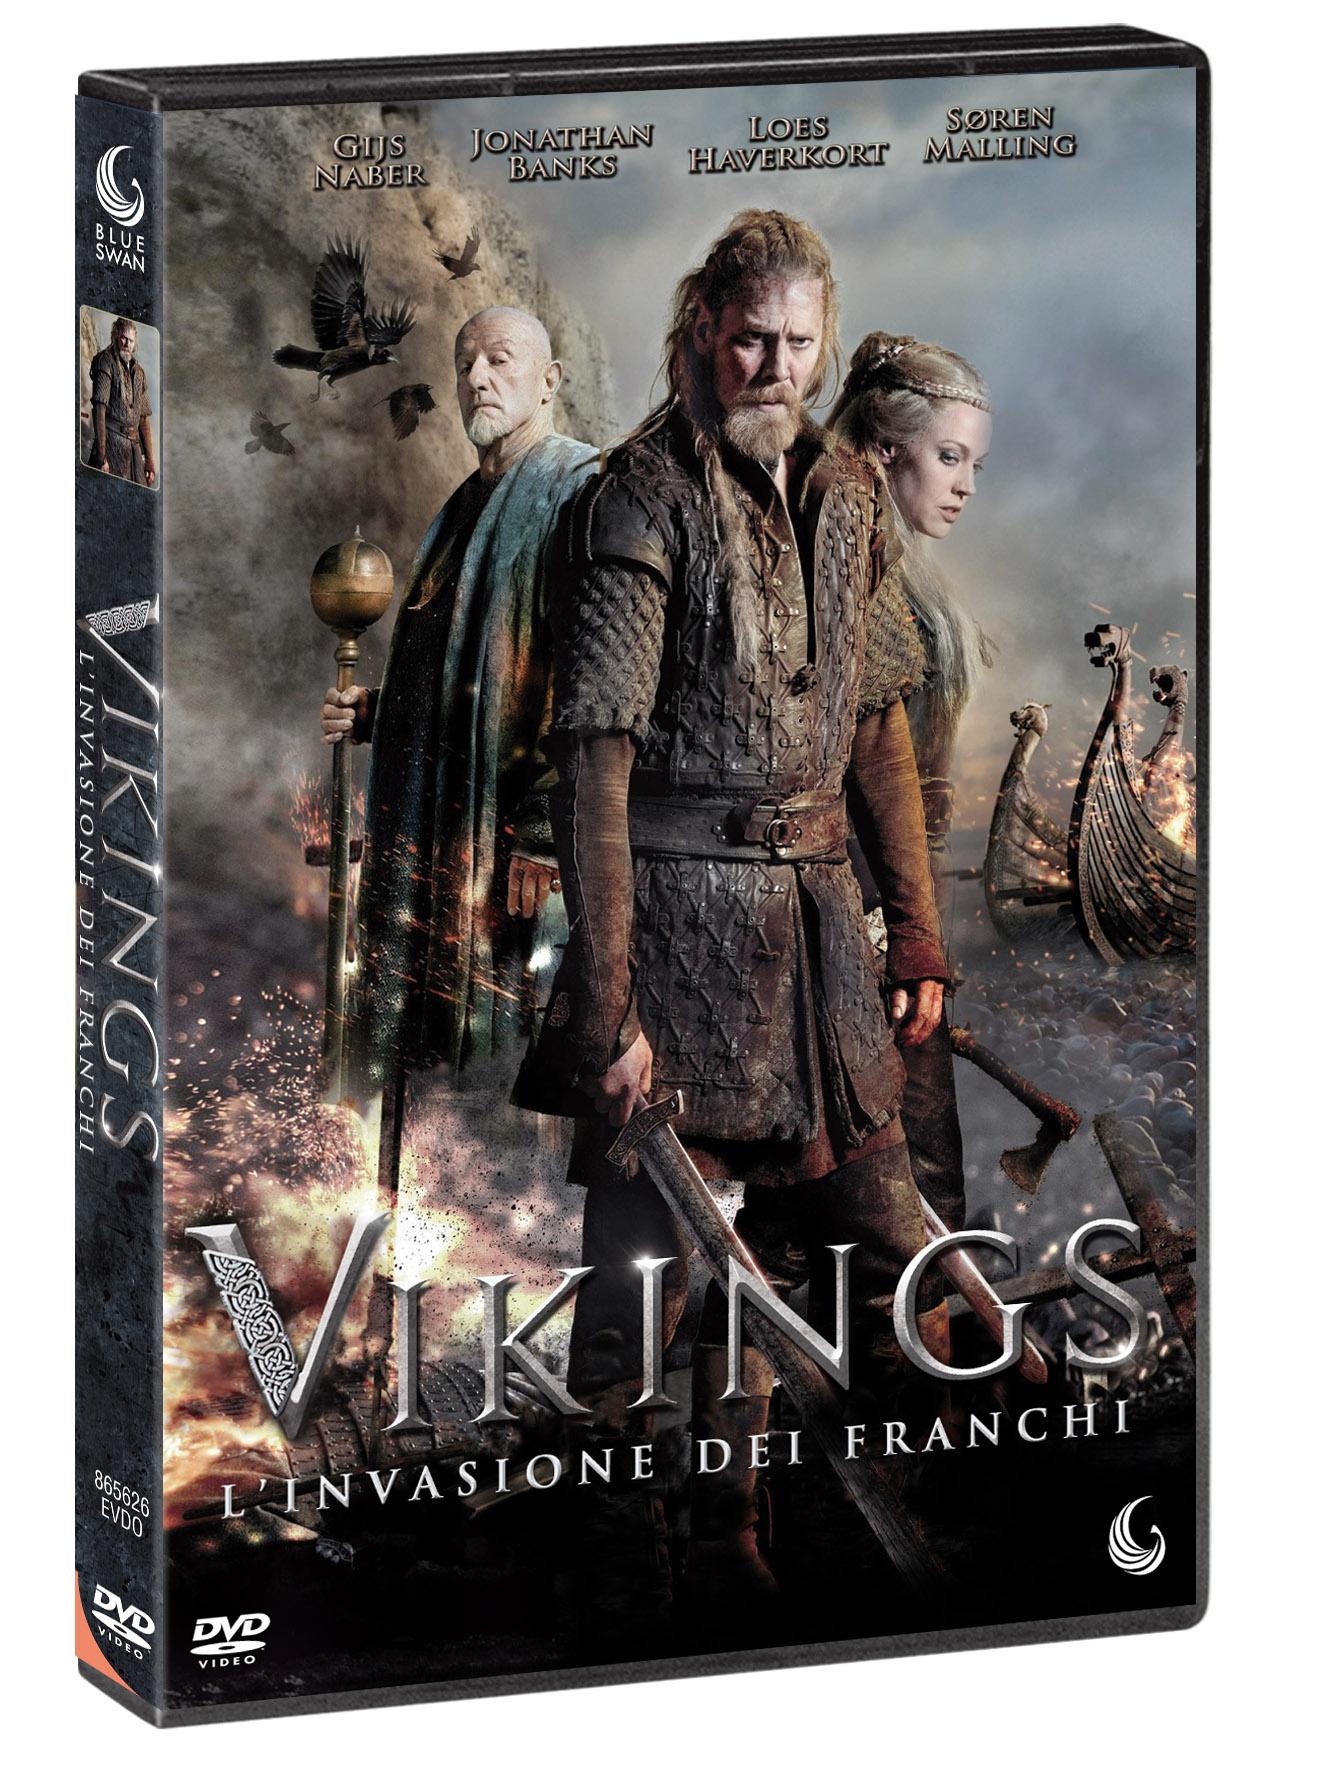 VIKINGS - L'INVASIONE DEI FRANCHI (DVD)